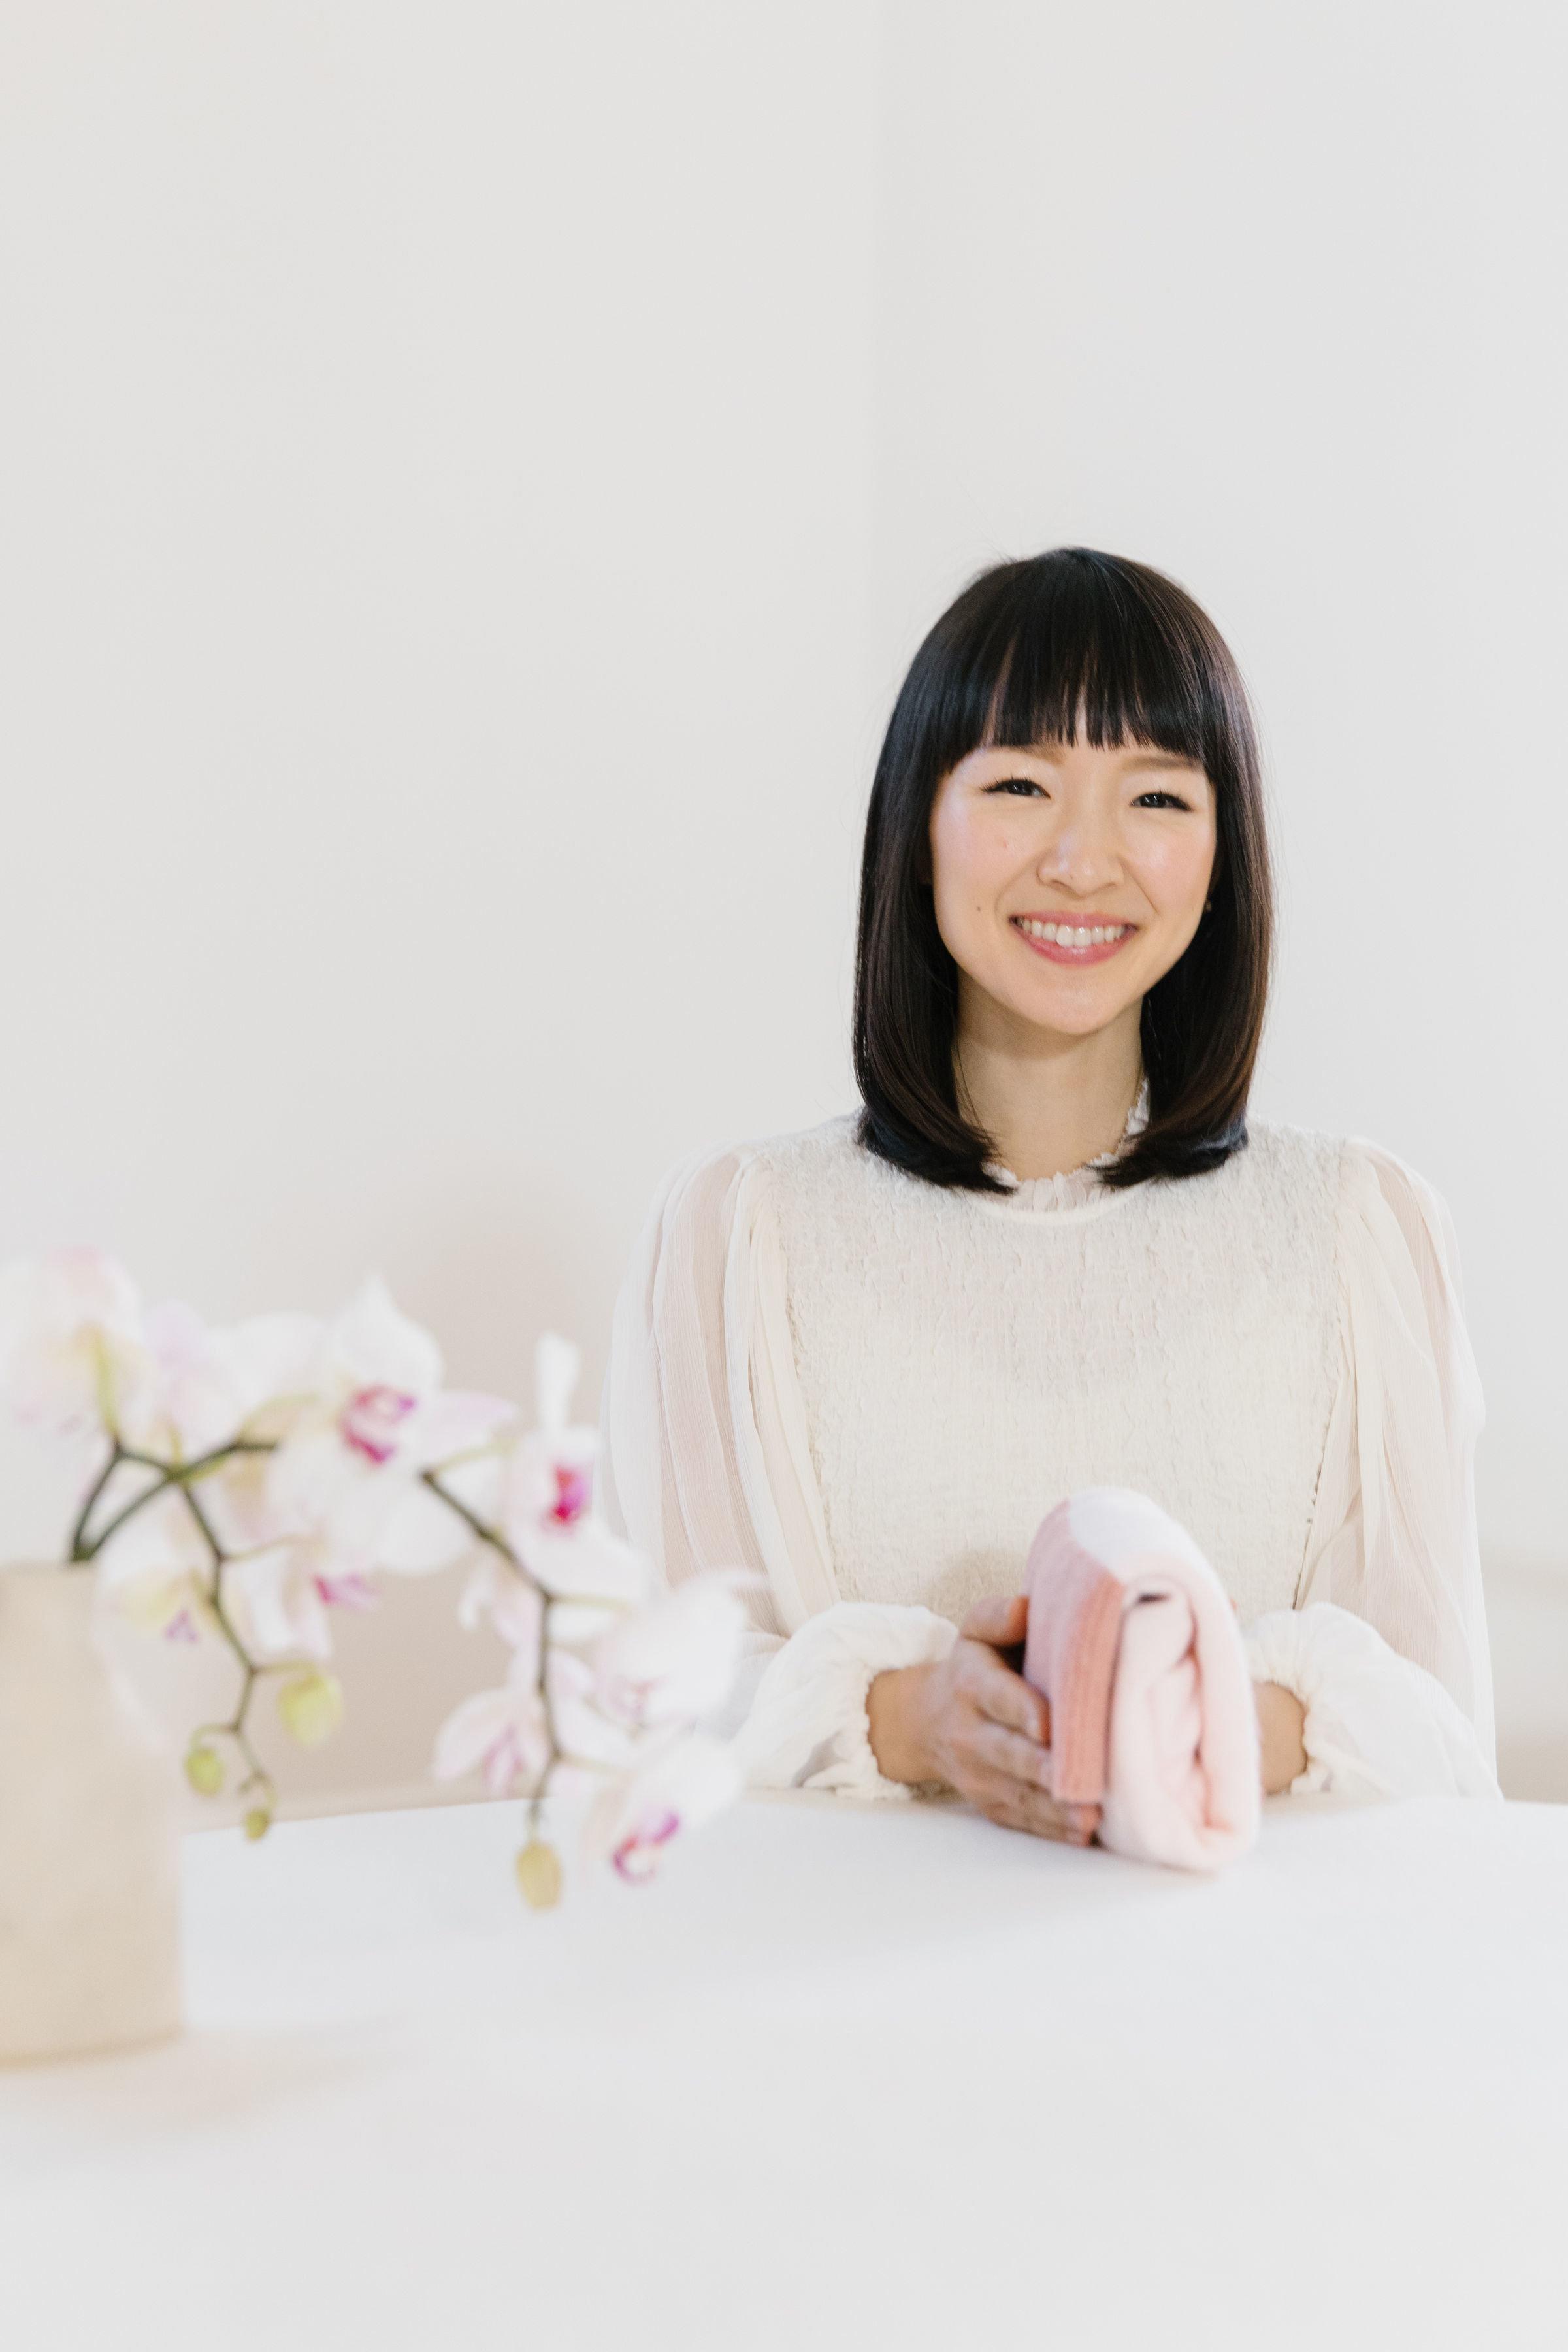 Marie Kondo smiling